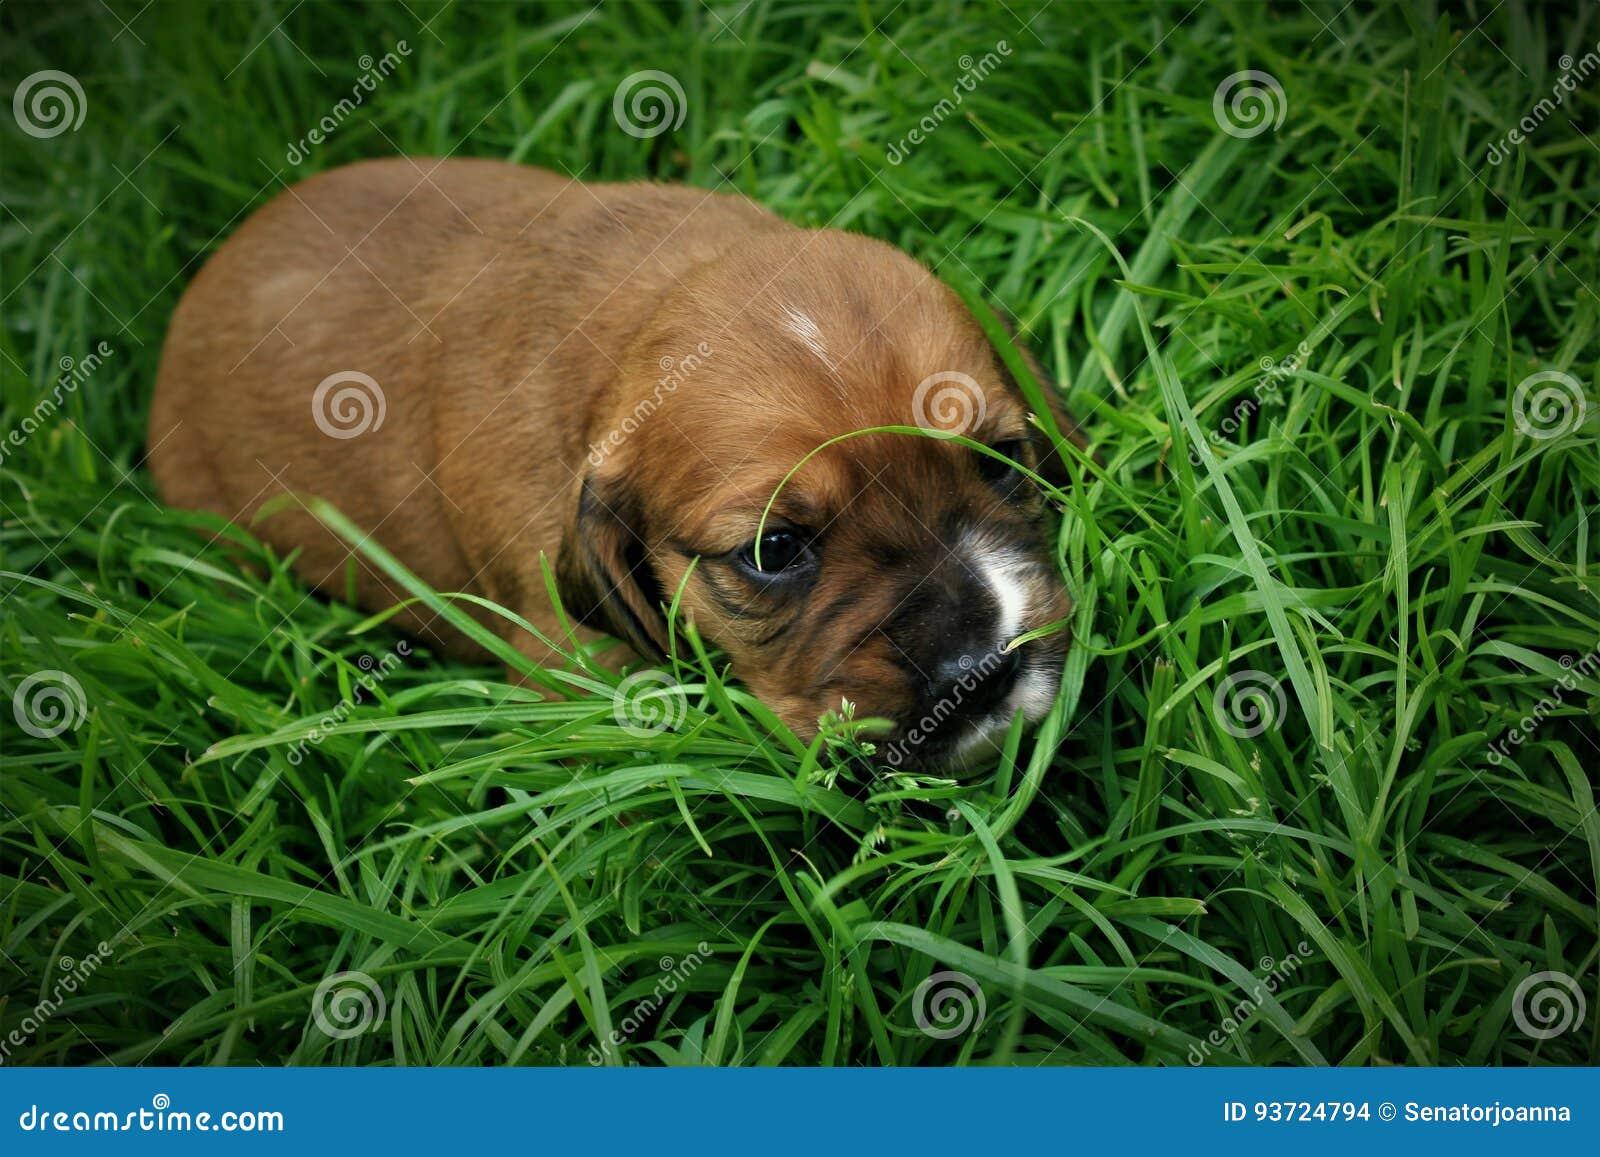 A little puppy on the grass